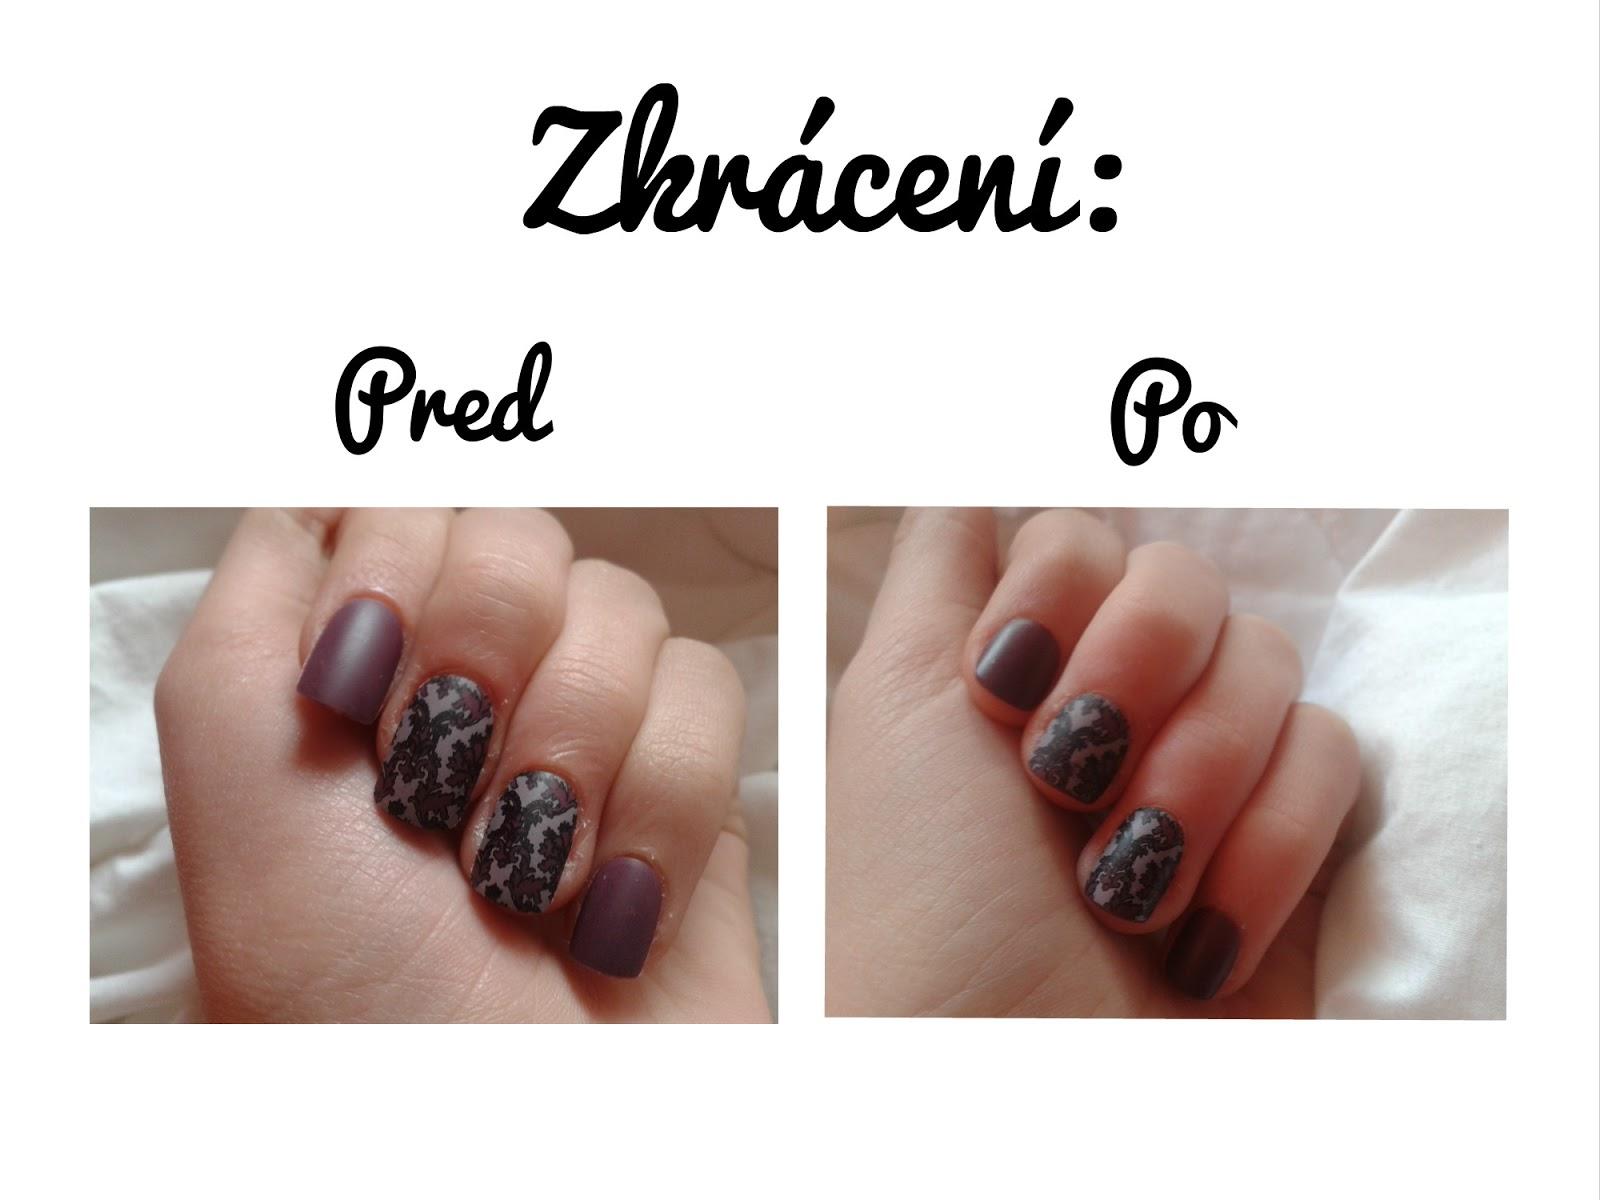 Be Yourself Nails Nalepovaci Umele Nehty